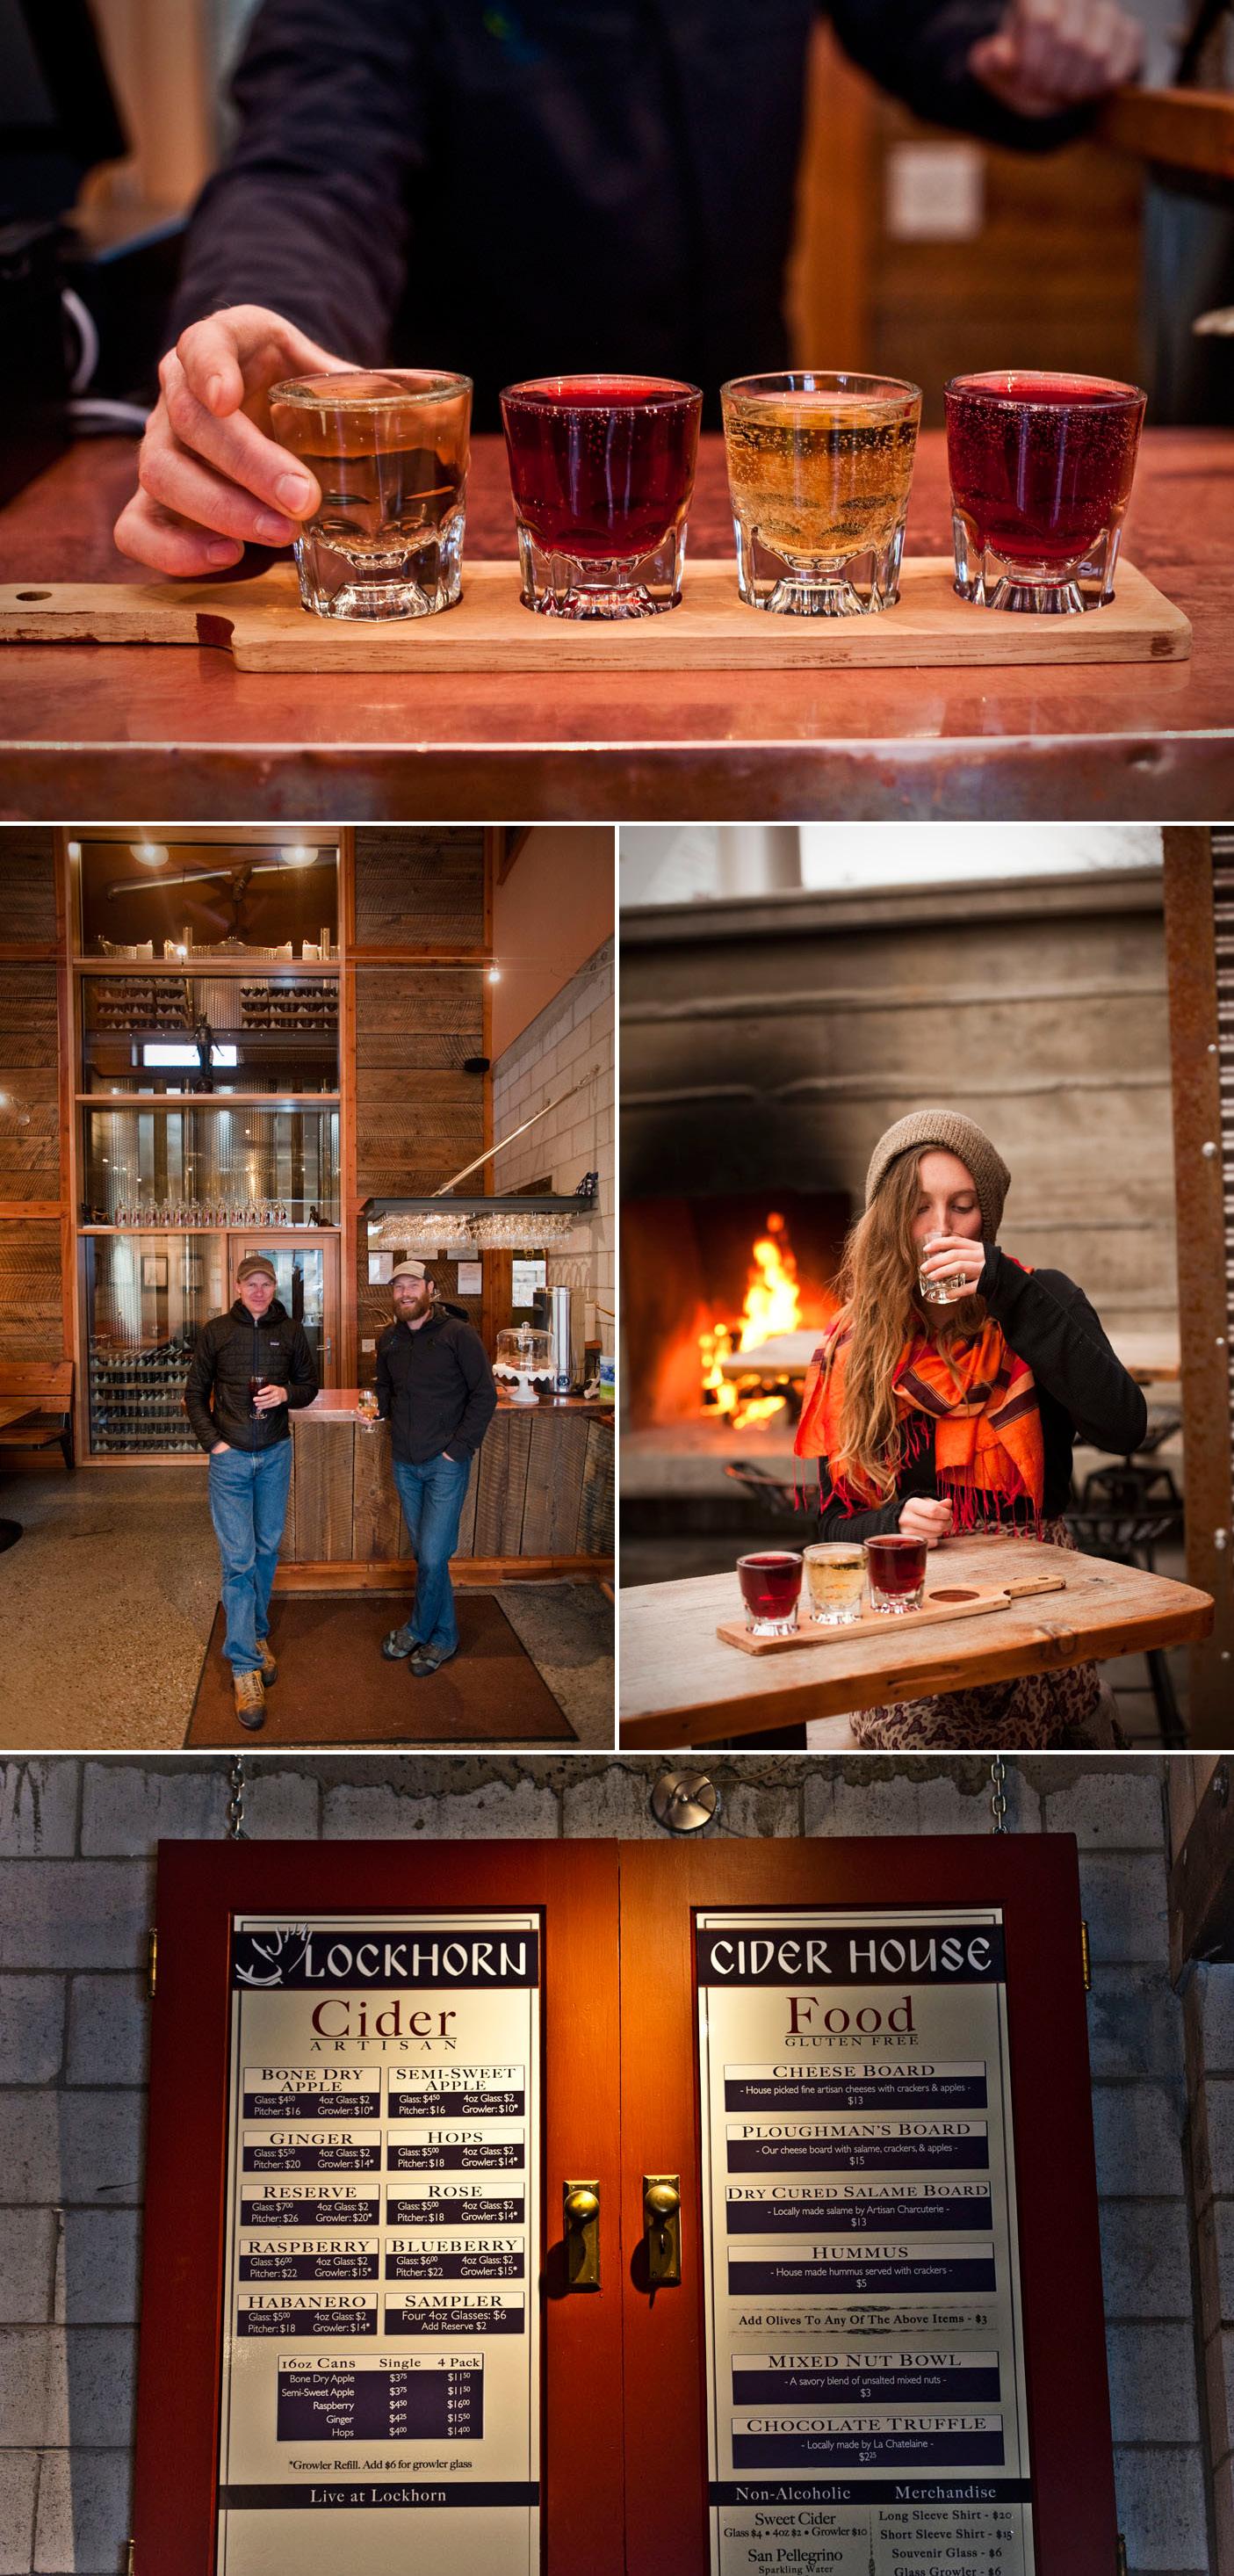 Lockhorn Cider - Bozeman, Montana